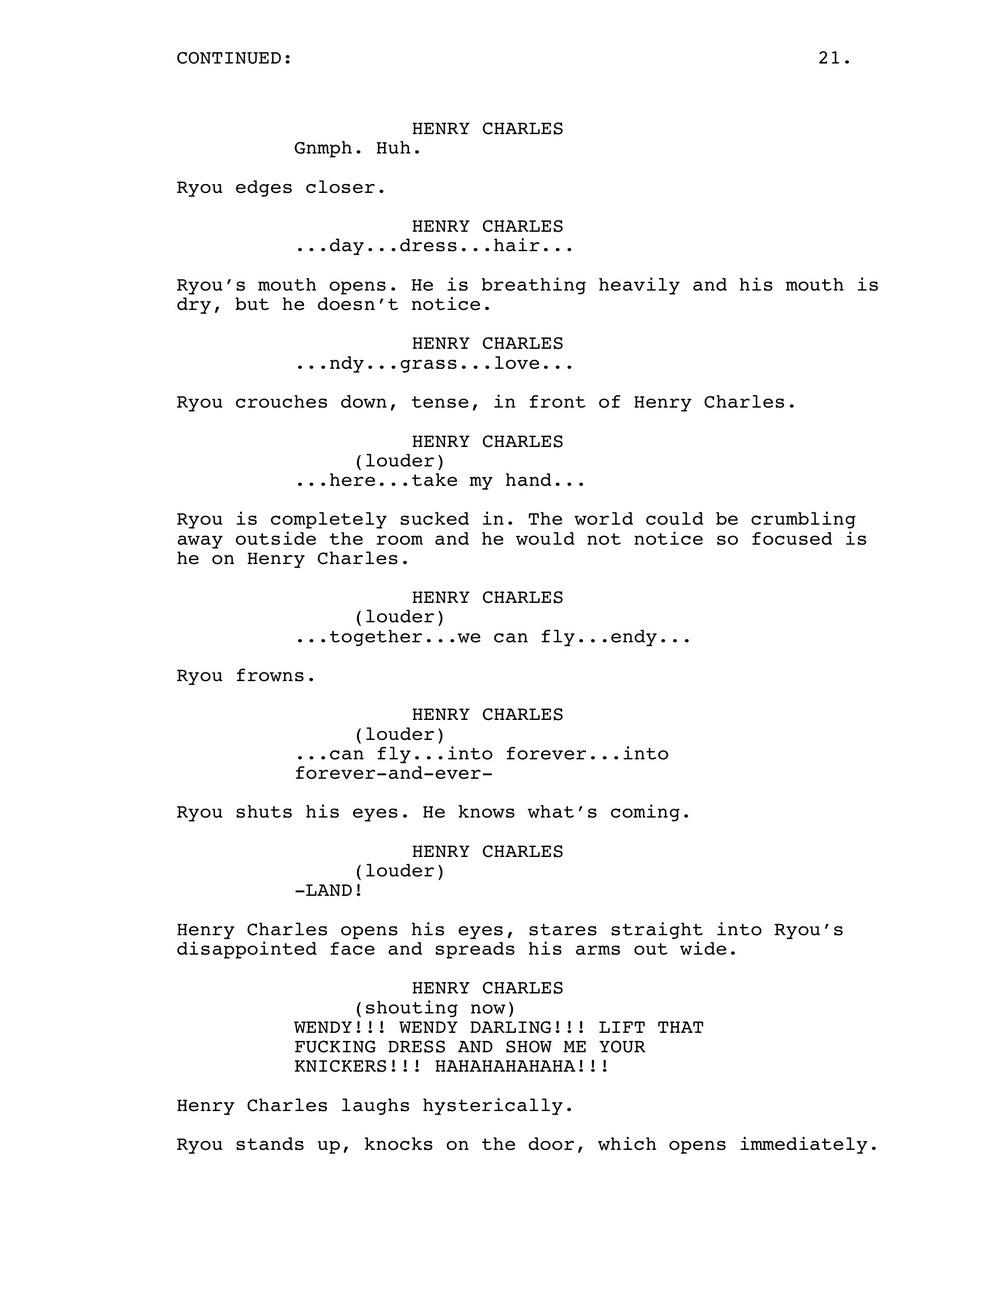 'Introducing Henry Charles' (Pilot) by Alexander Craig | 21.jpeg